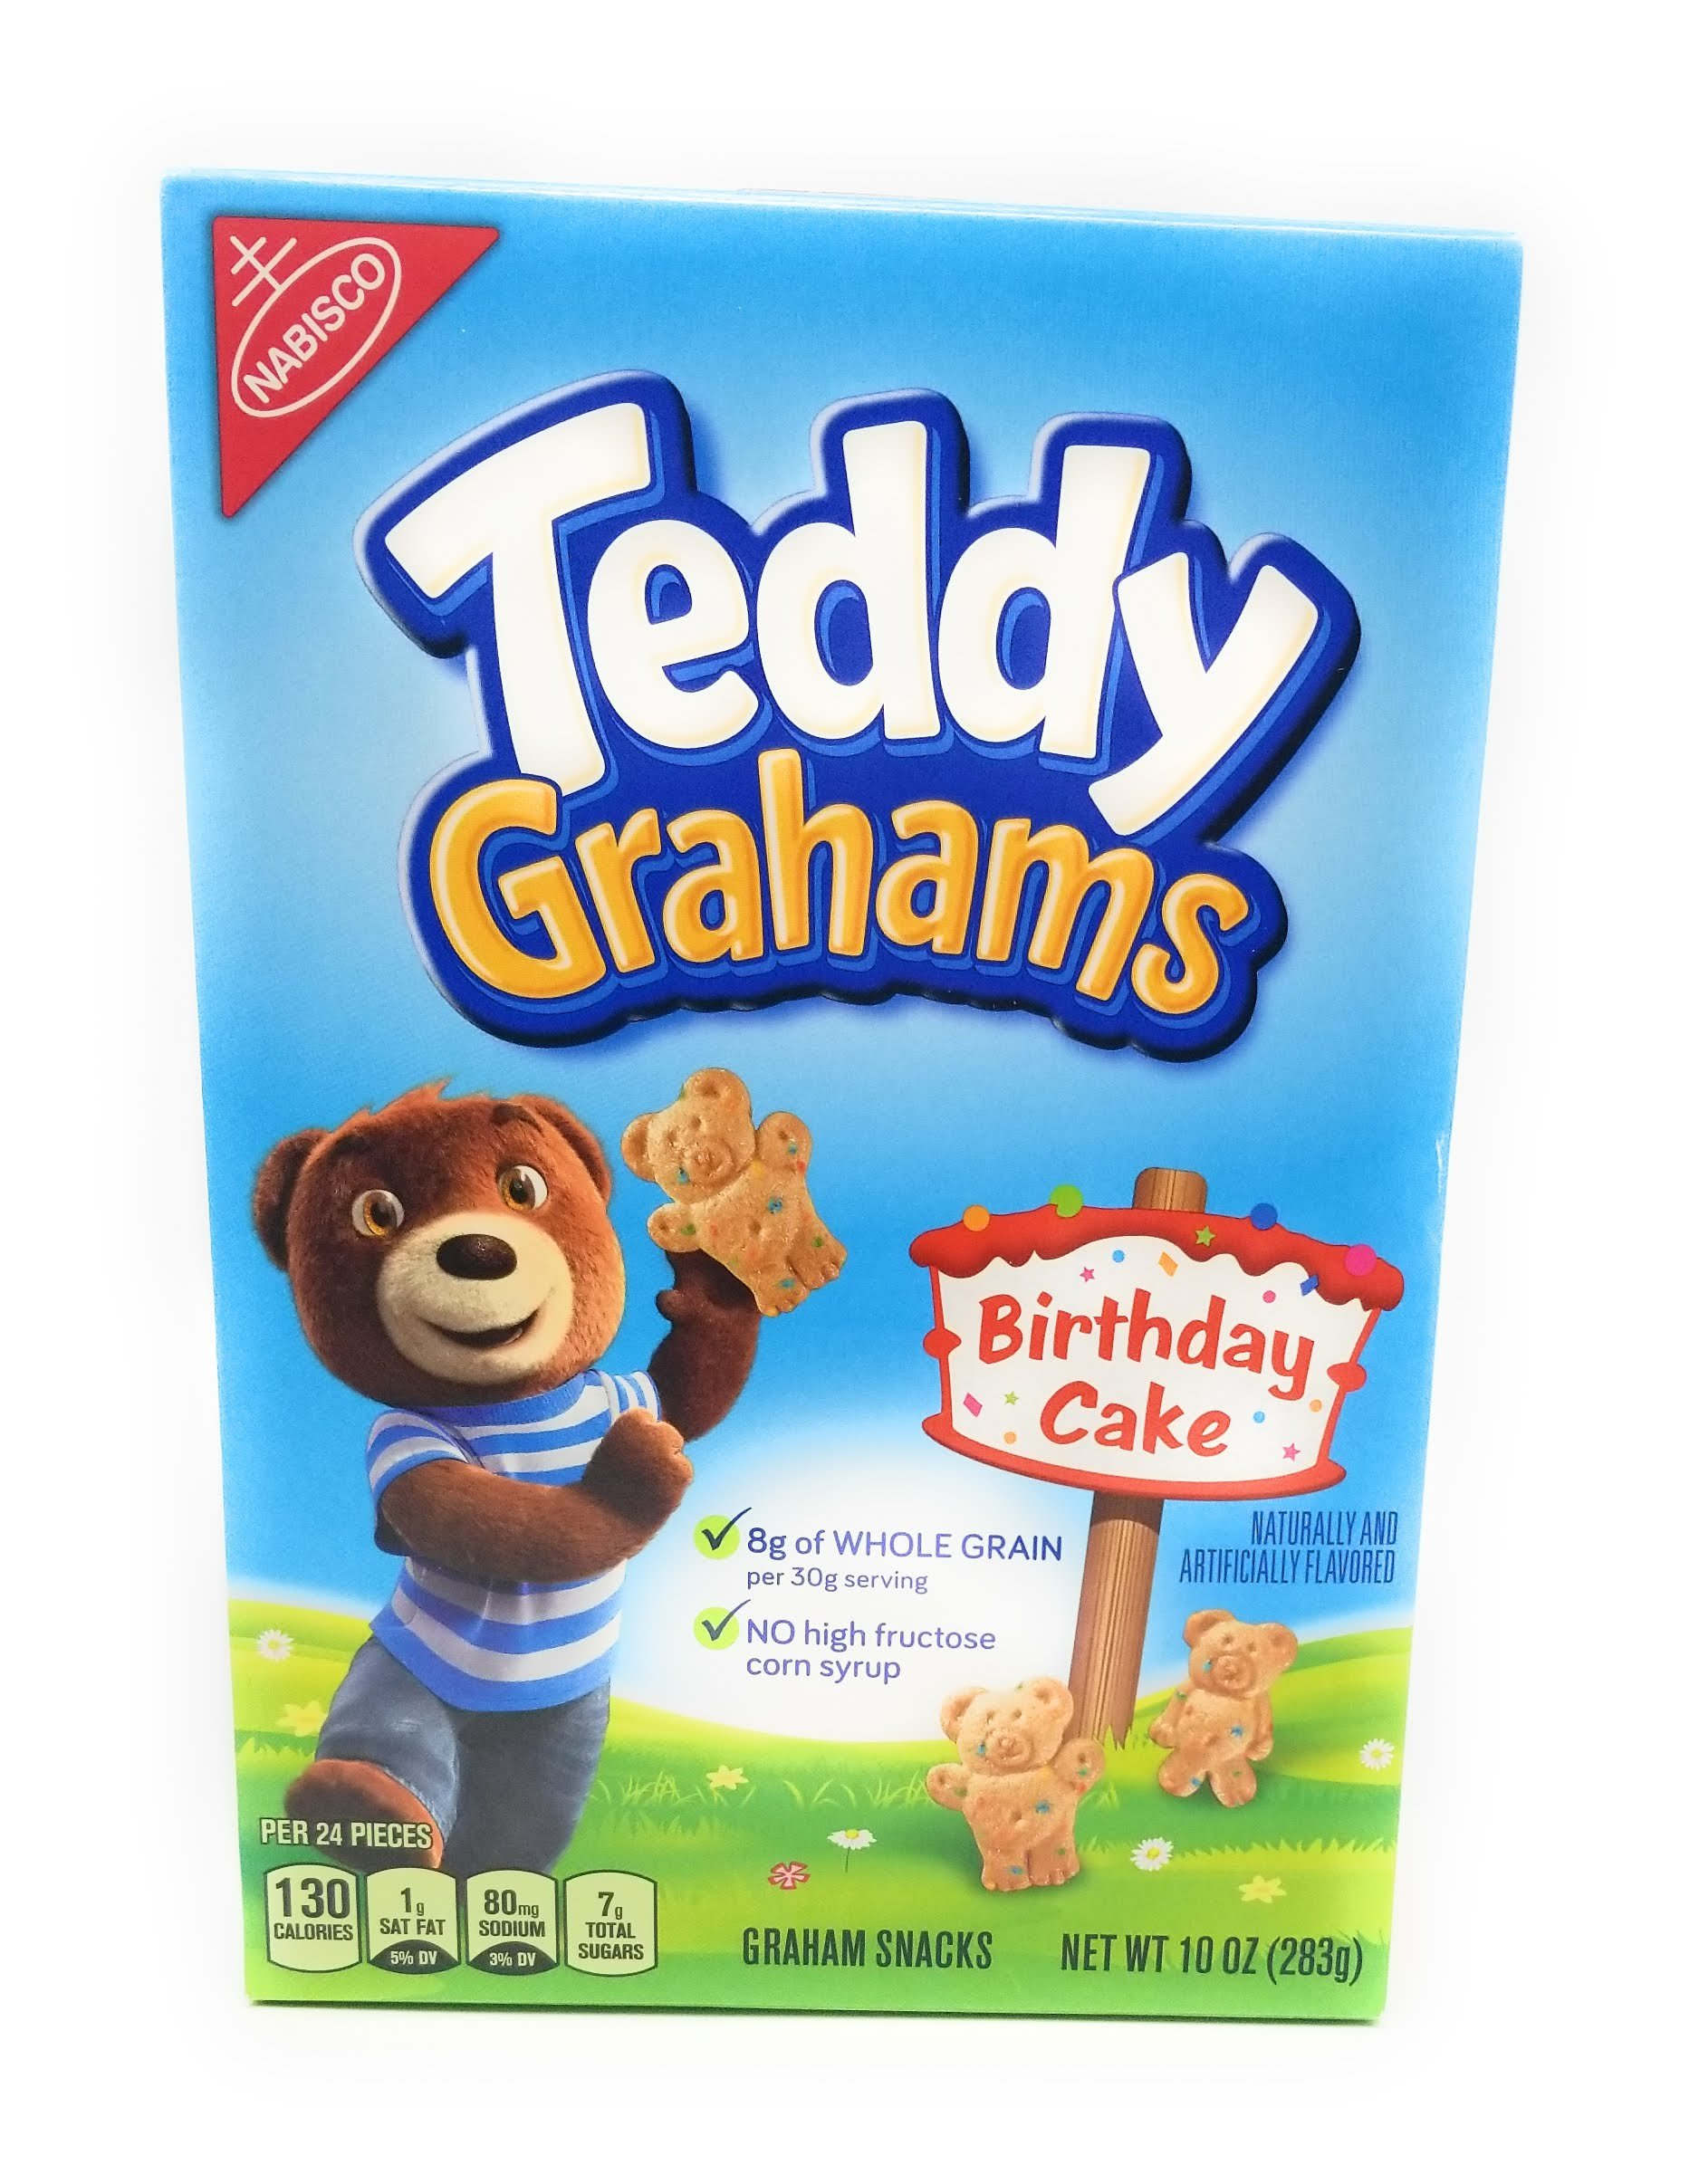 Nabisco Honey Maid Teddy Grahams - Birthday Cake Graham Cracker Snacks - (2) 10oz Boxes